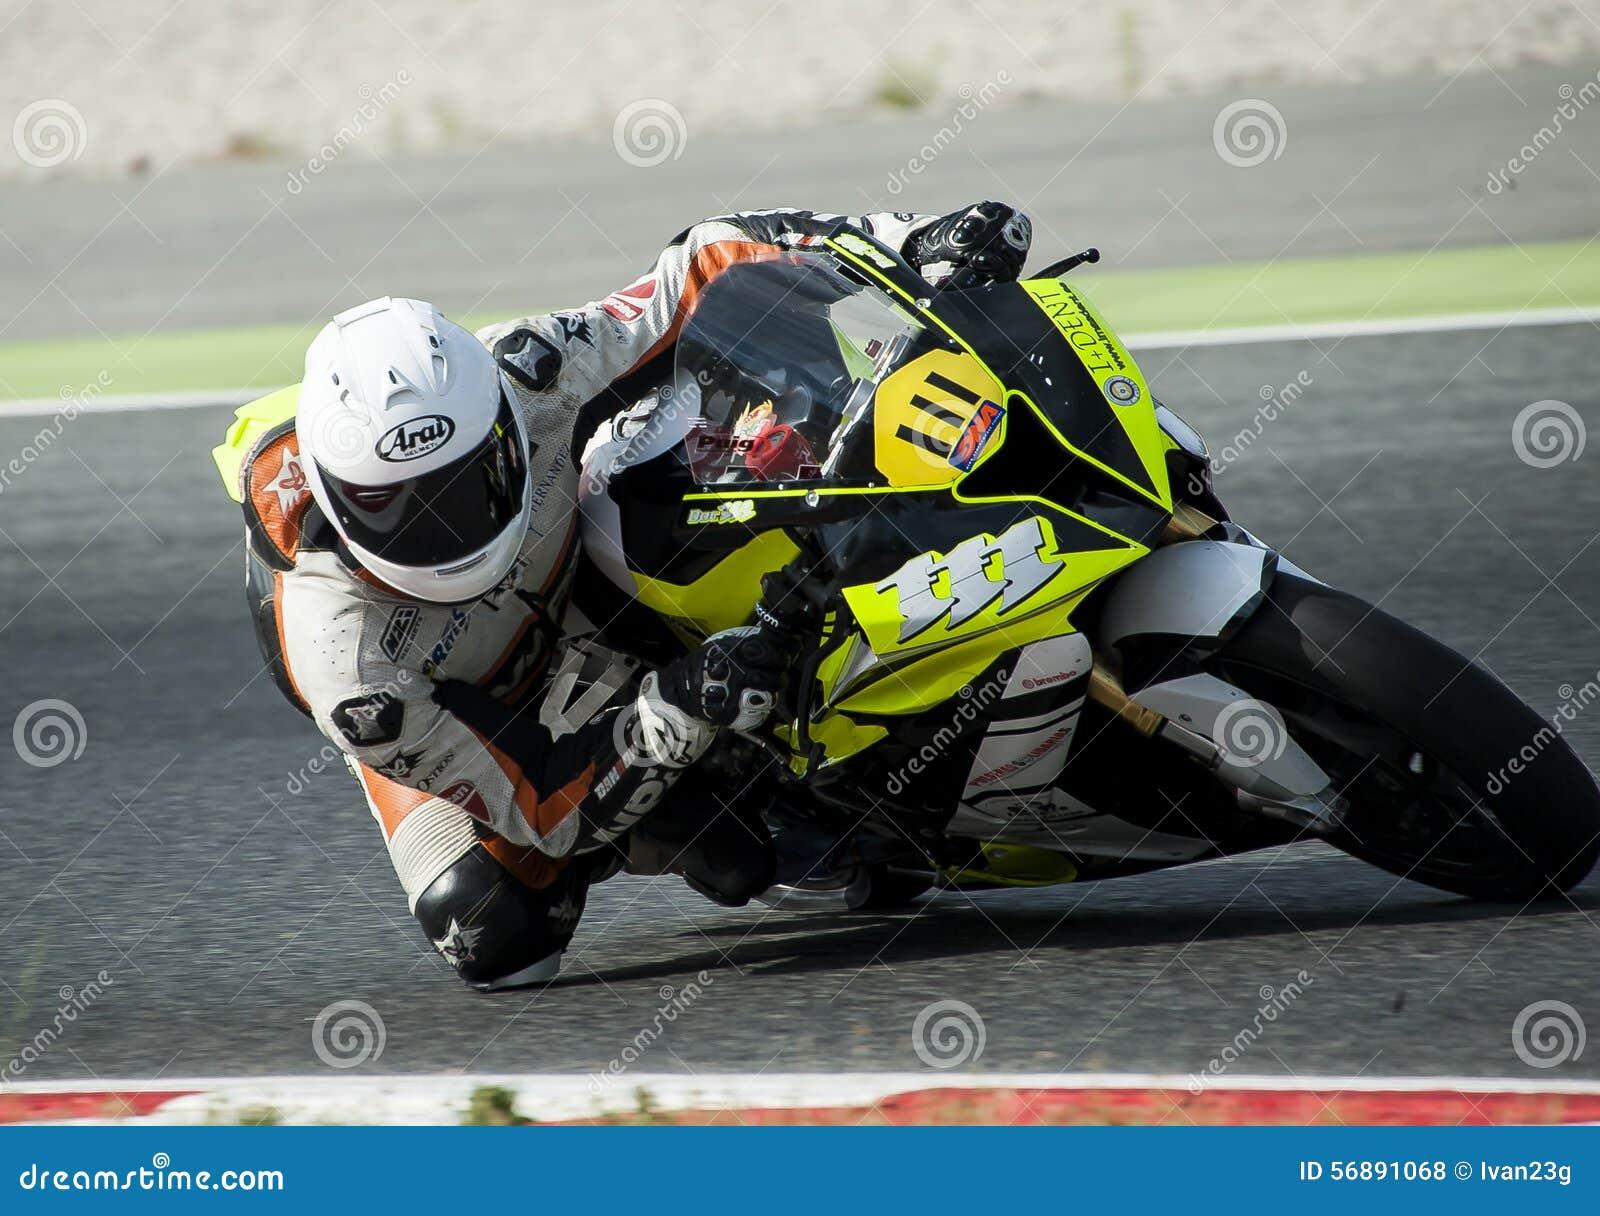 CAMPIONATO CATALANO di MOTOCICLISMO - Oscar Arias